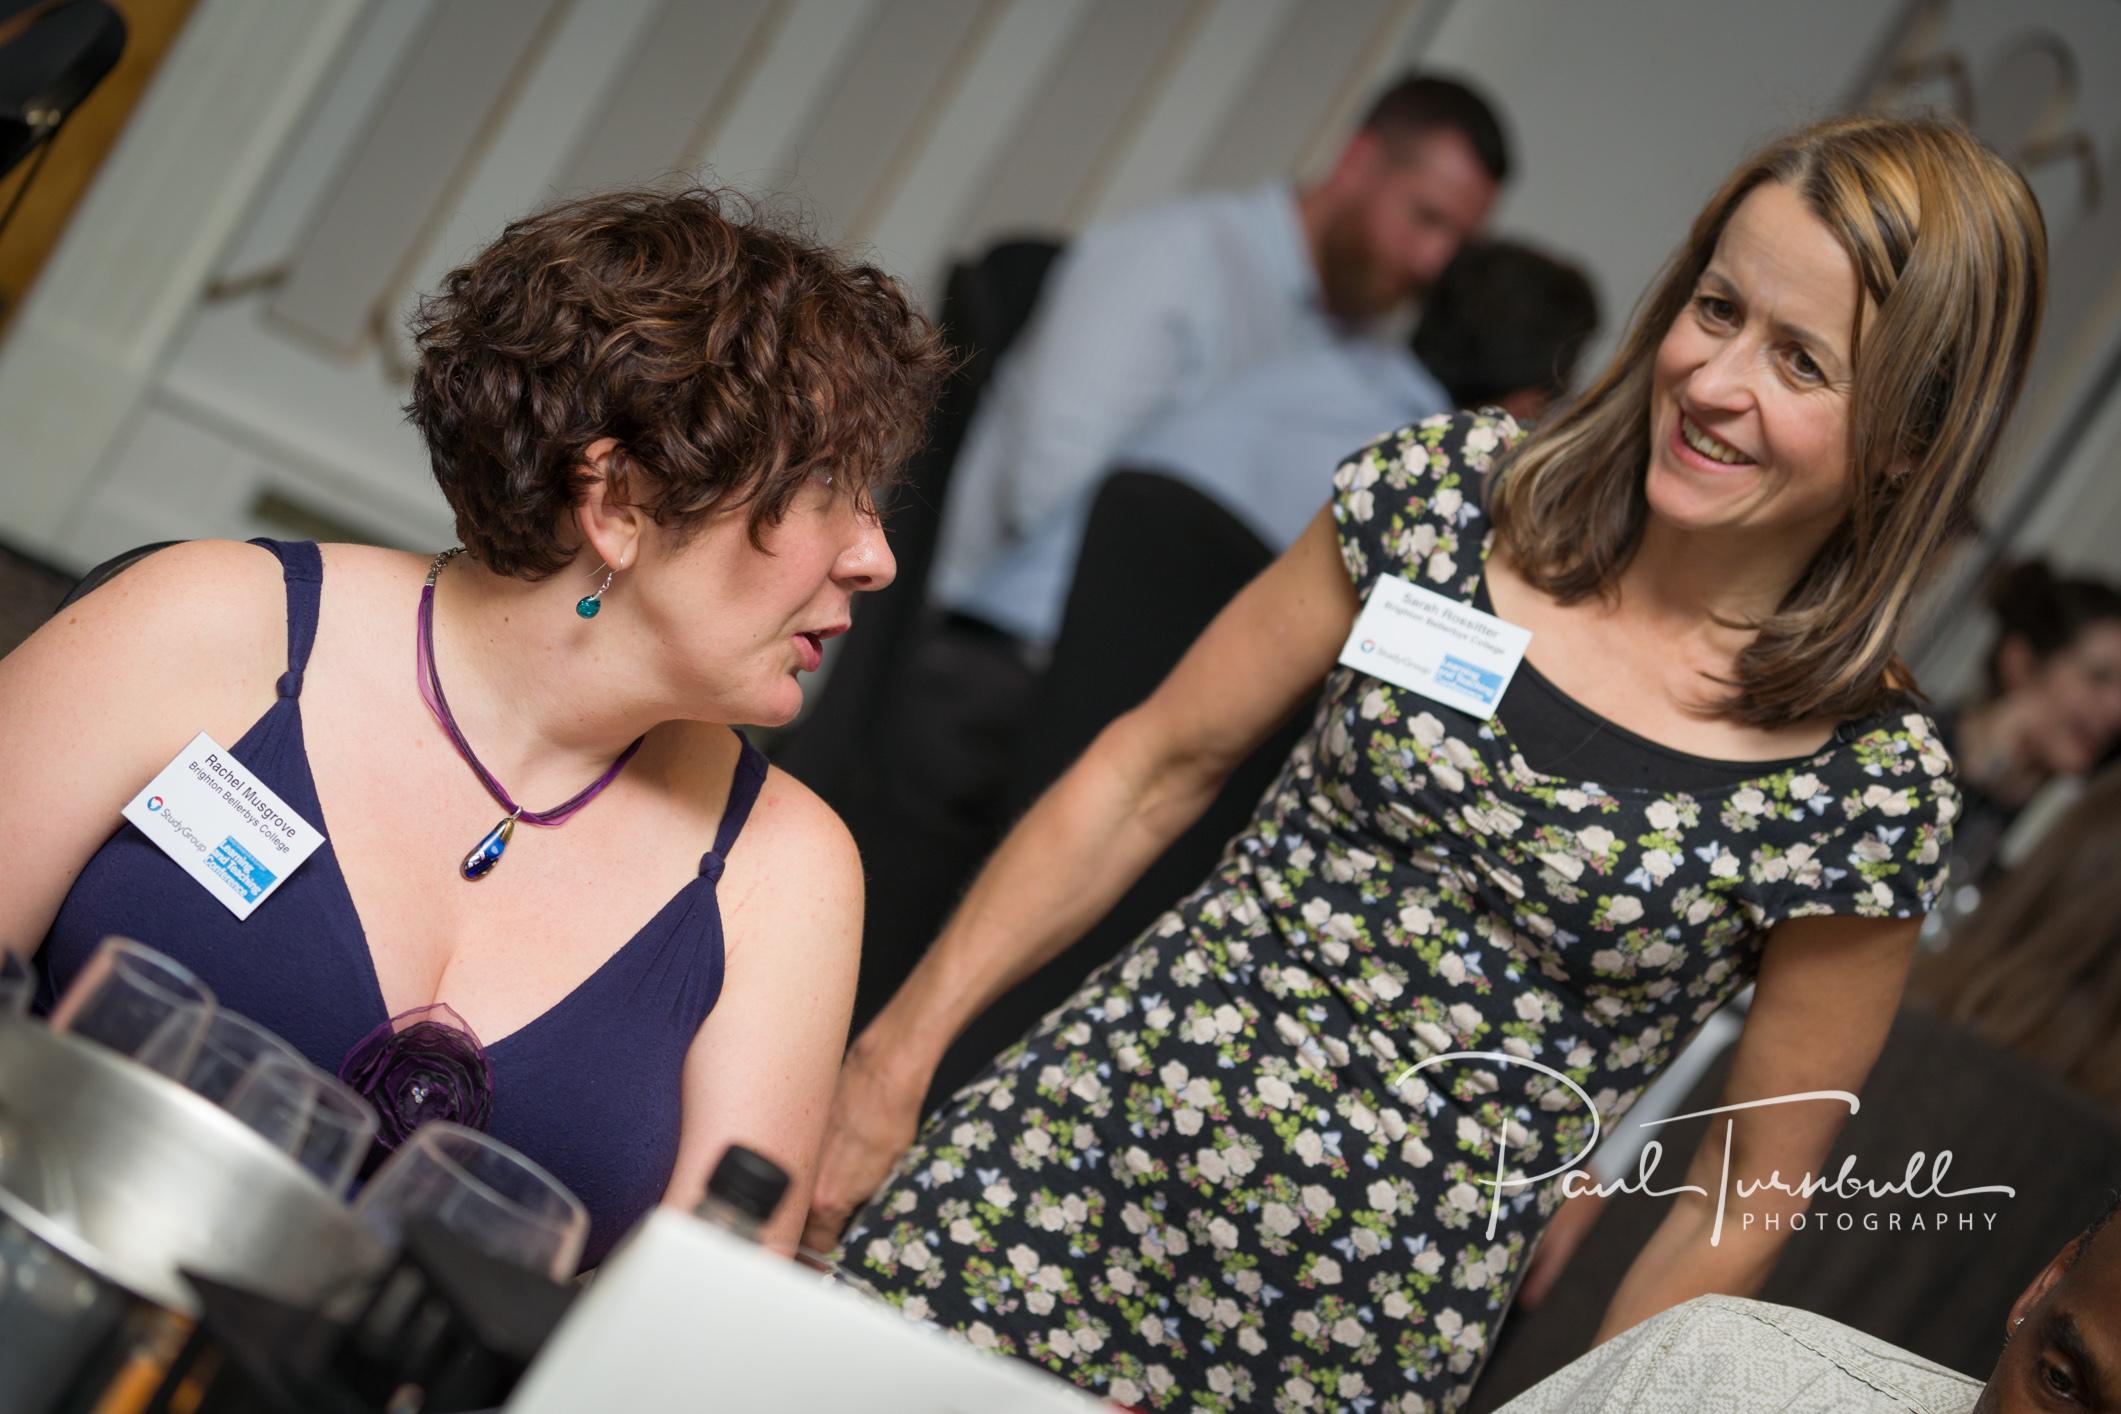 conference-event-photographer-queens-hotel-leeds-yorkshire-023.jpg